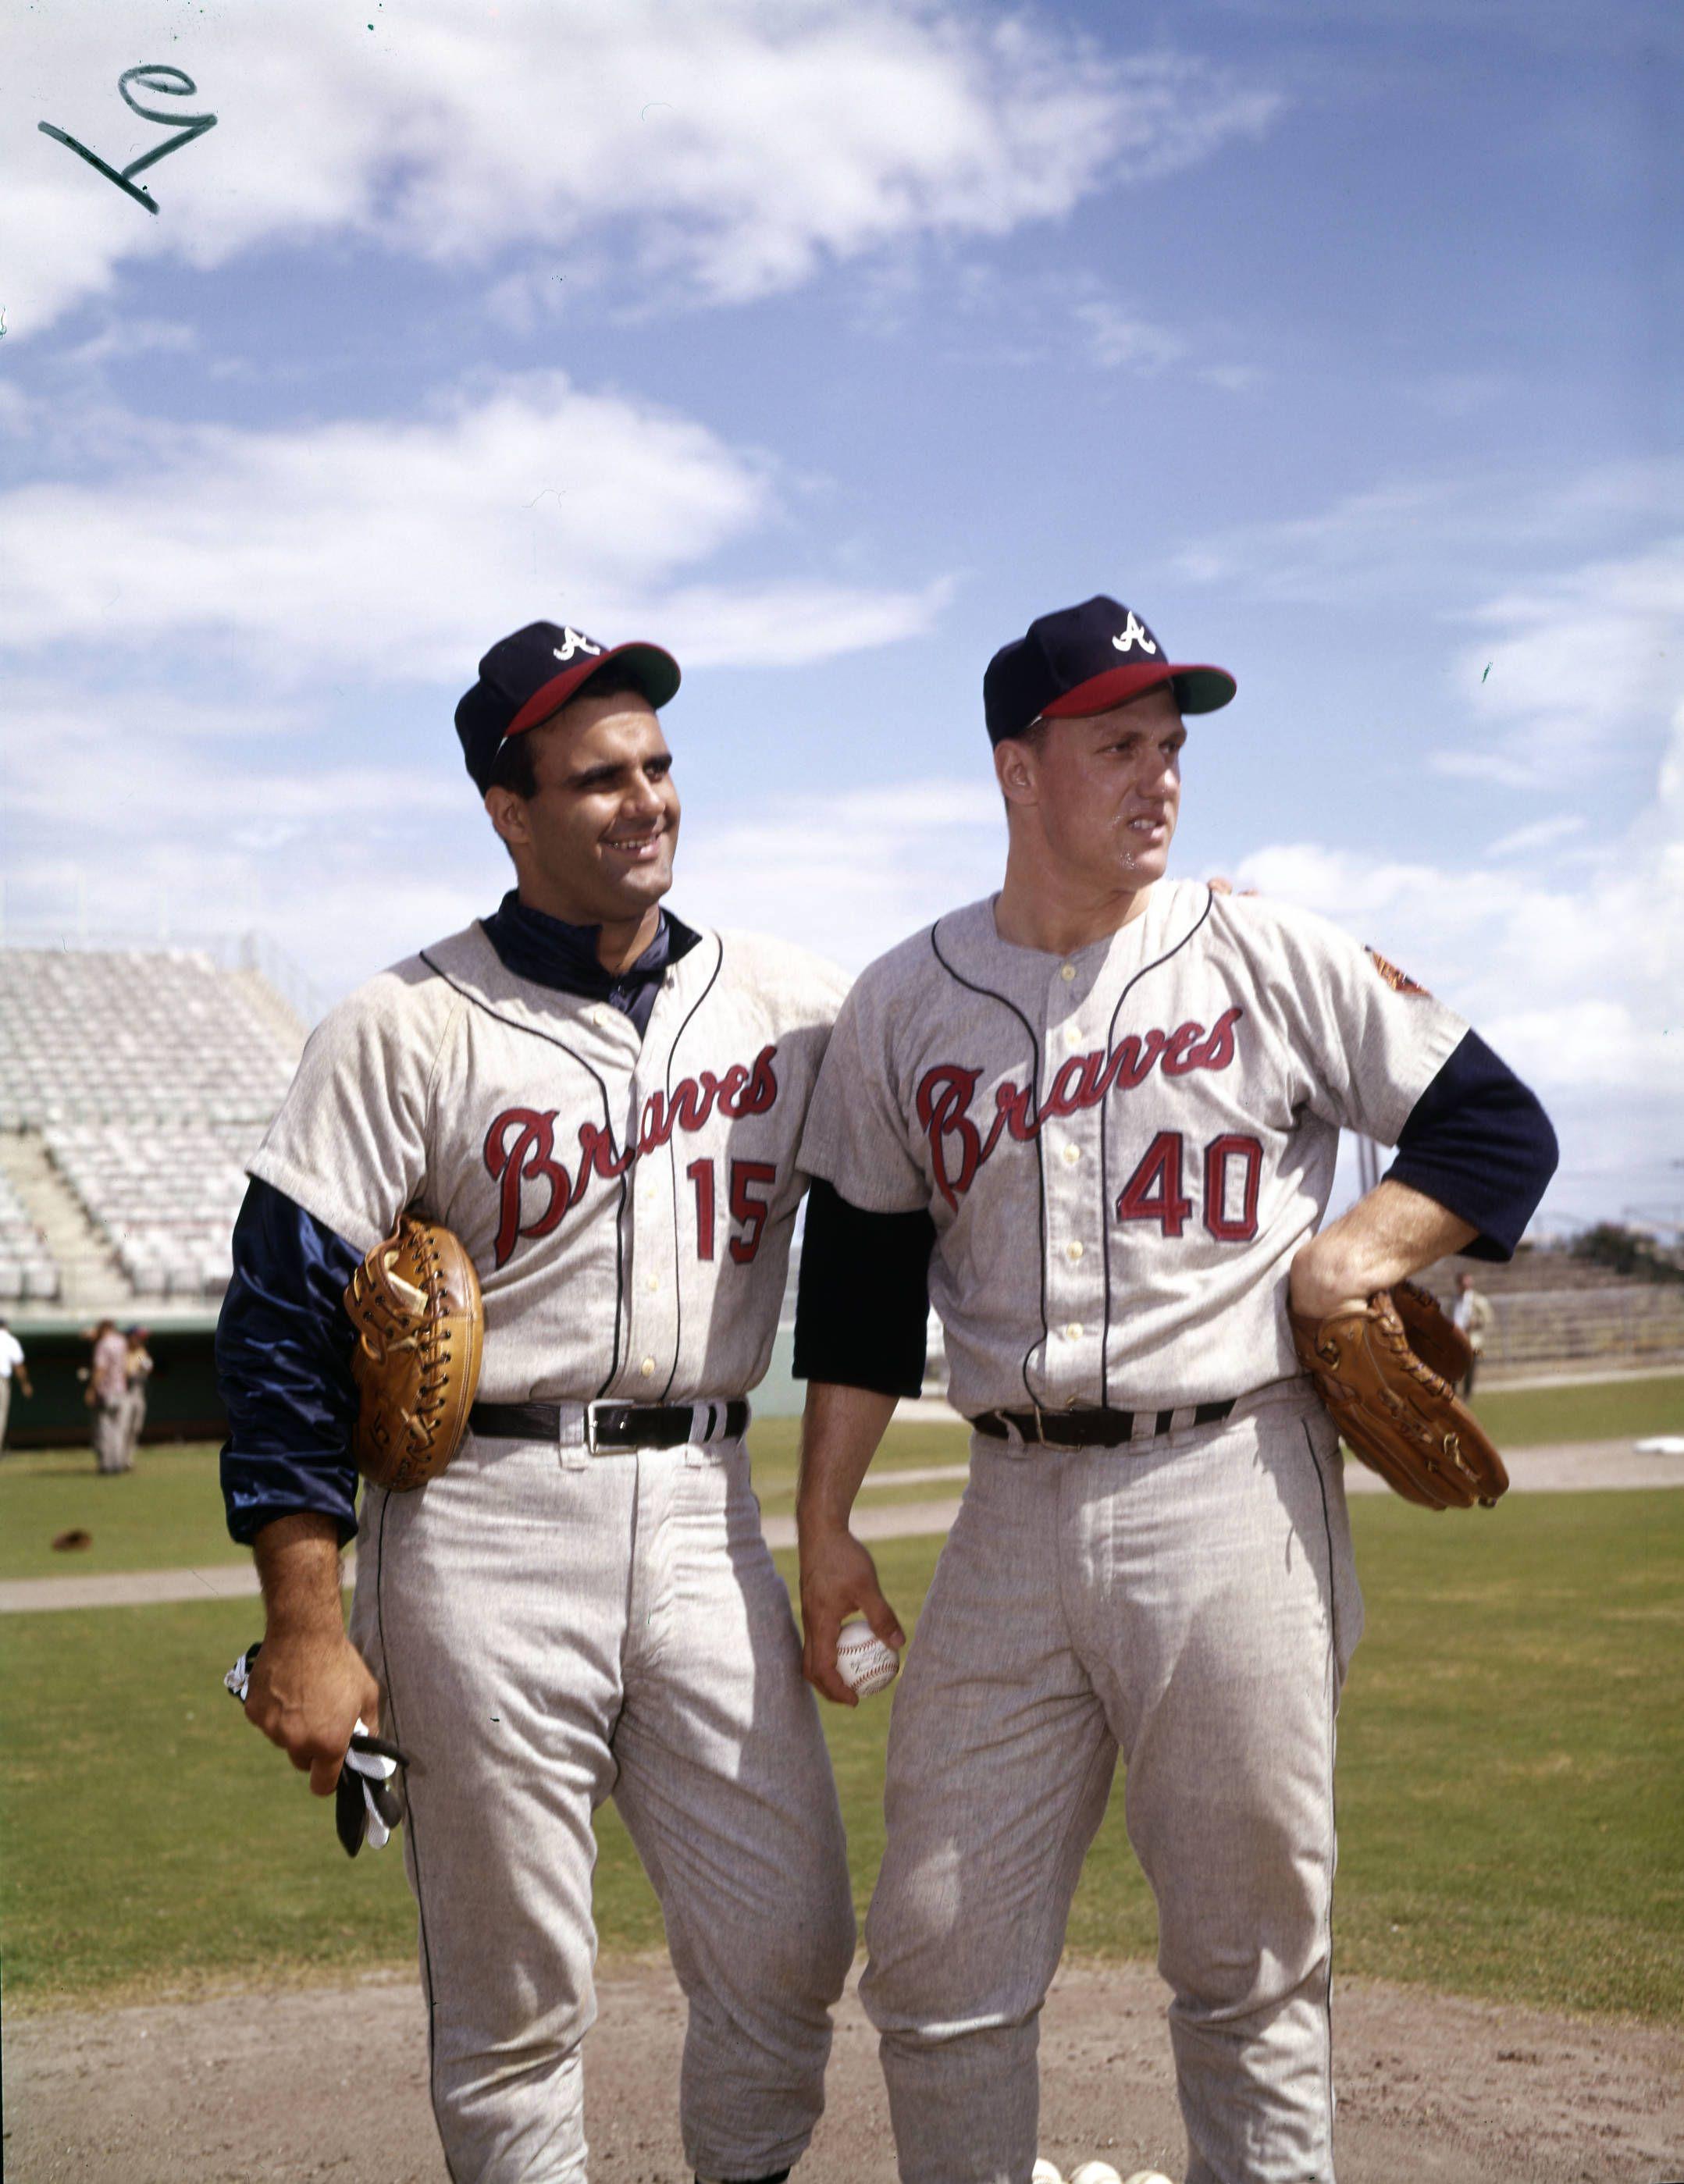 Flashback Fotos Atlanta And Georgia In 1966 Famous Baseball Players Atlanta Braves Pittsburgh Pirates Baseball